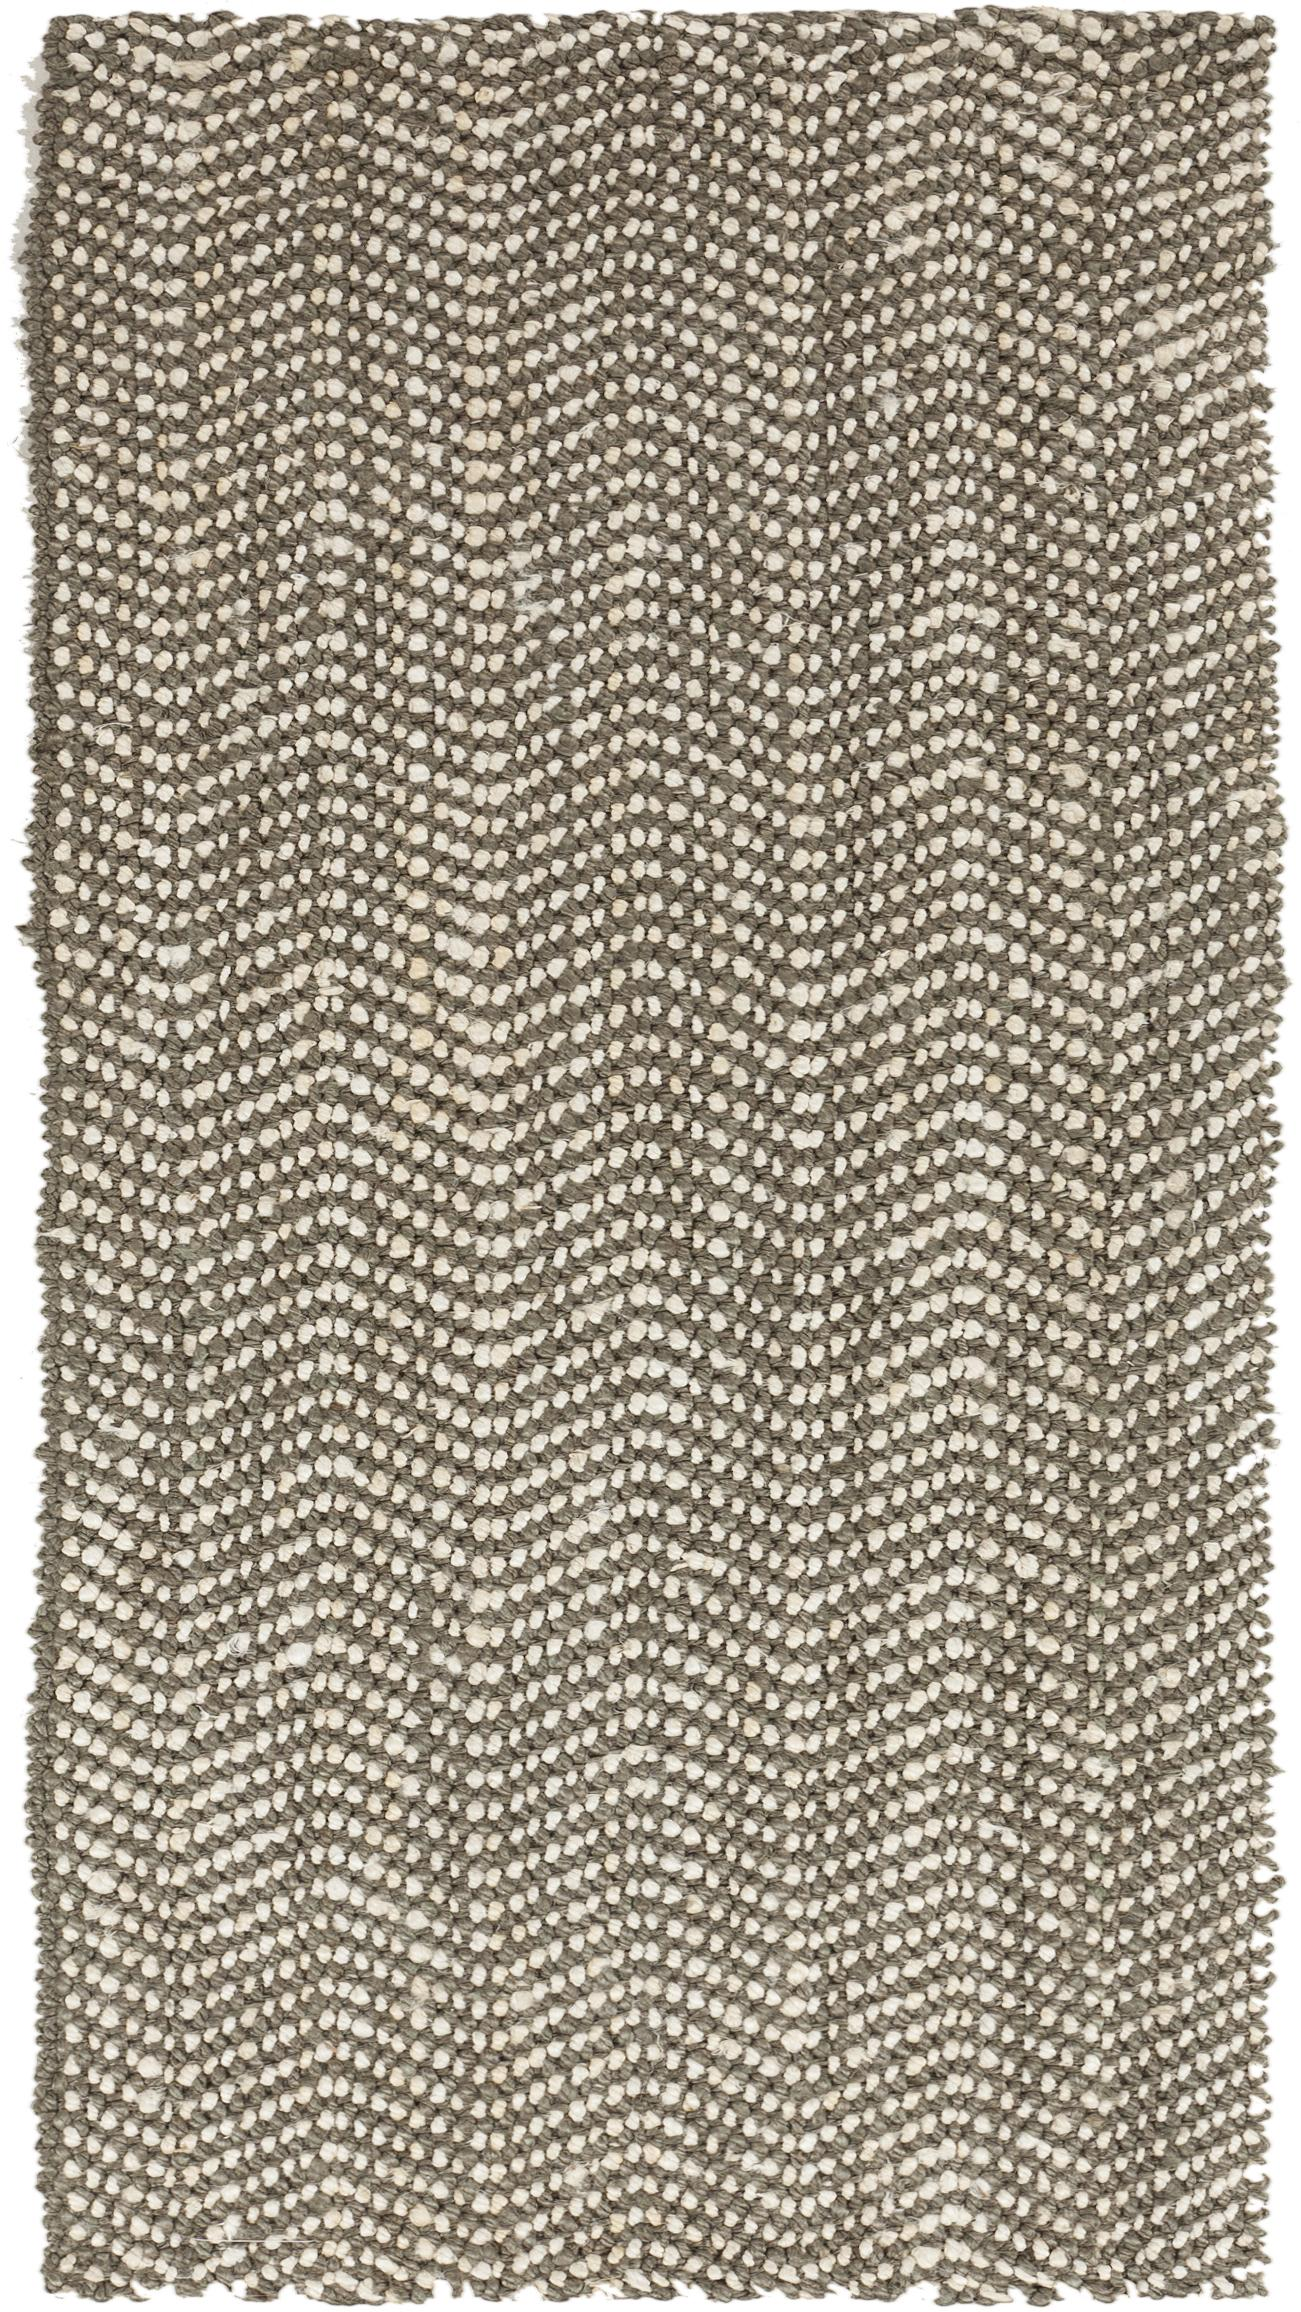 Surya Reeds 8' x 11' - Item Number: REED800-811